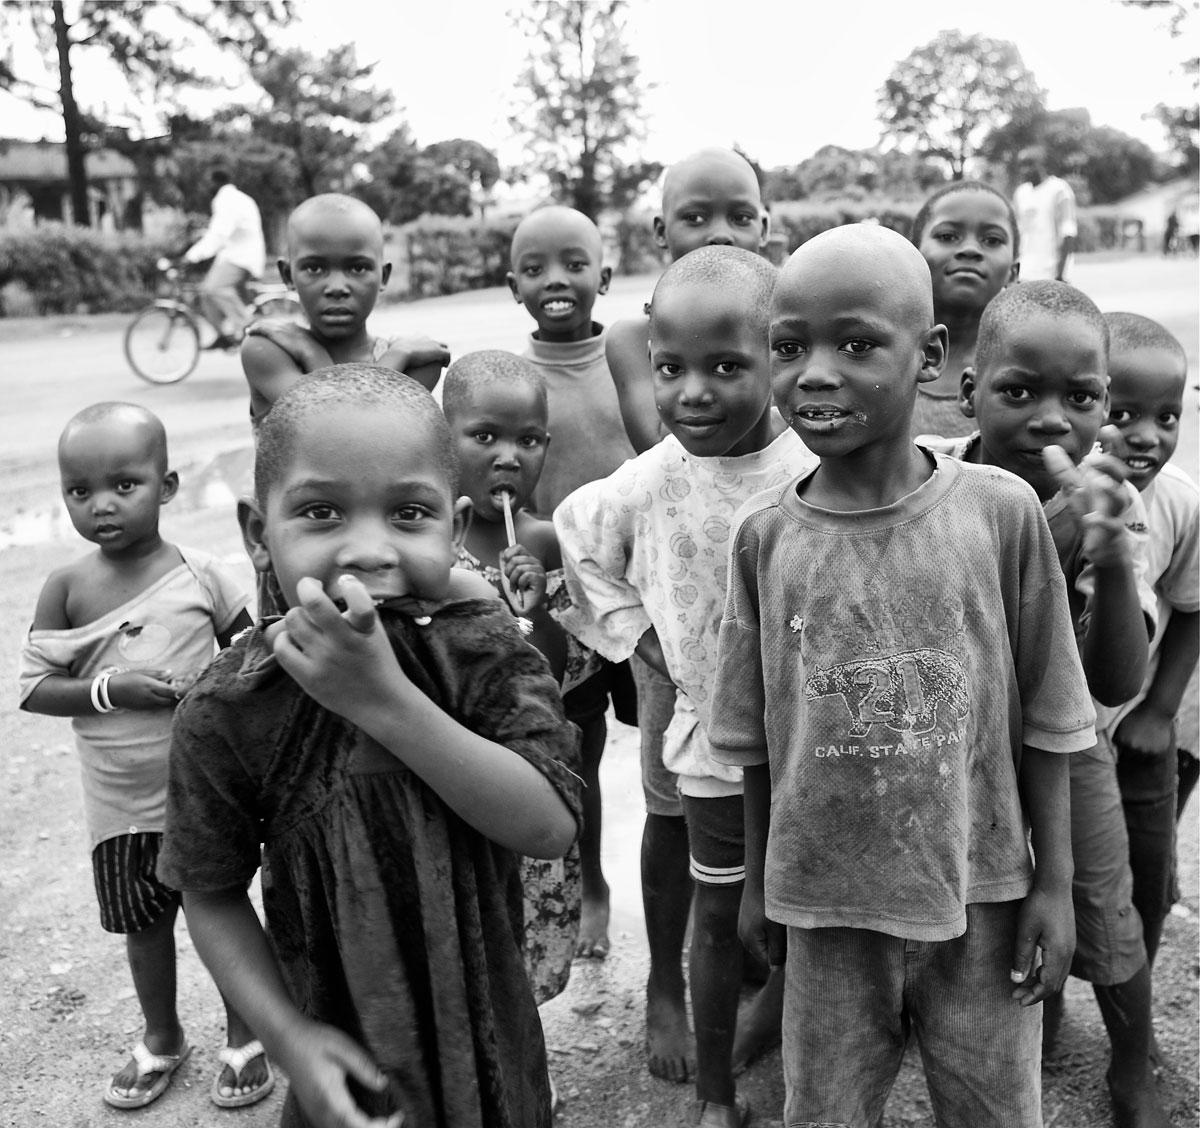 uganda_059_SP